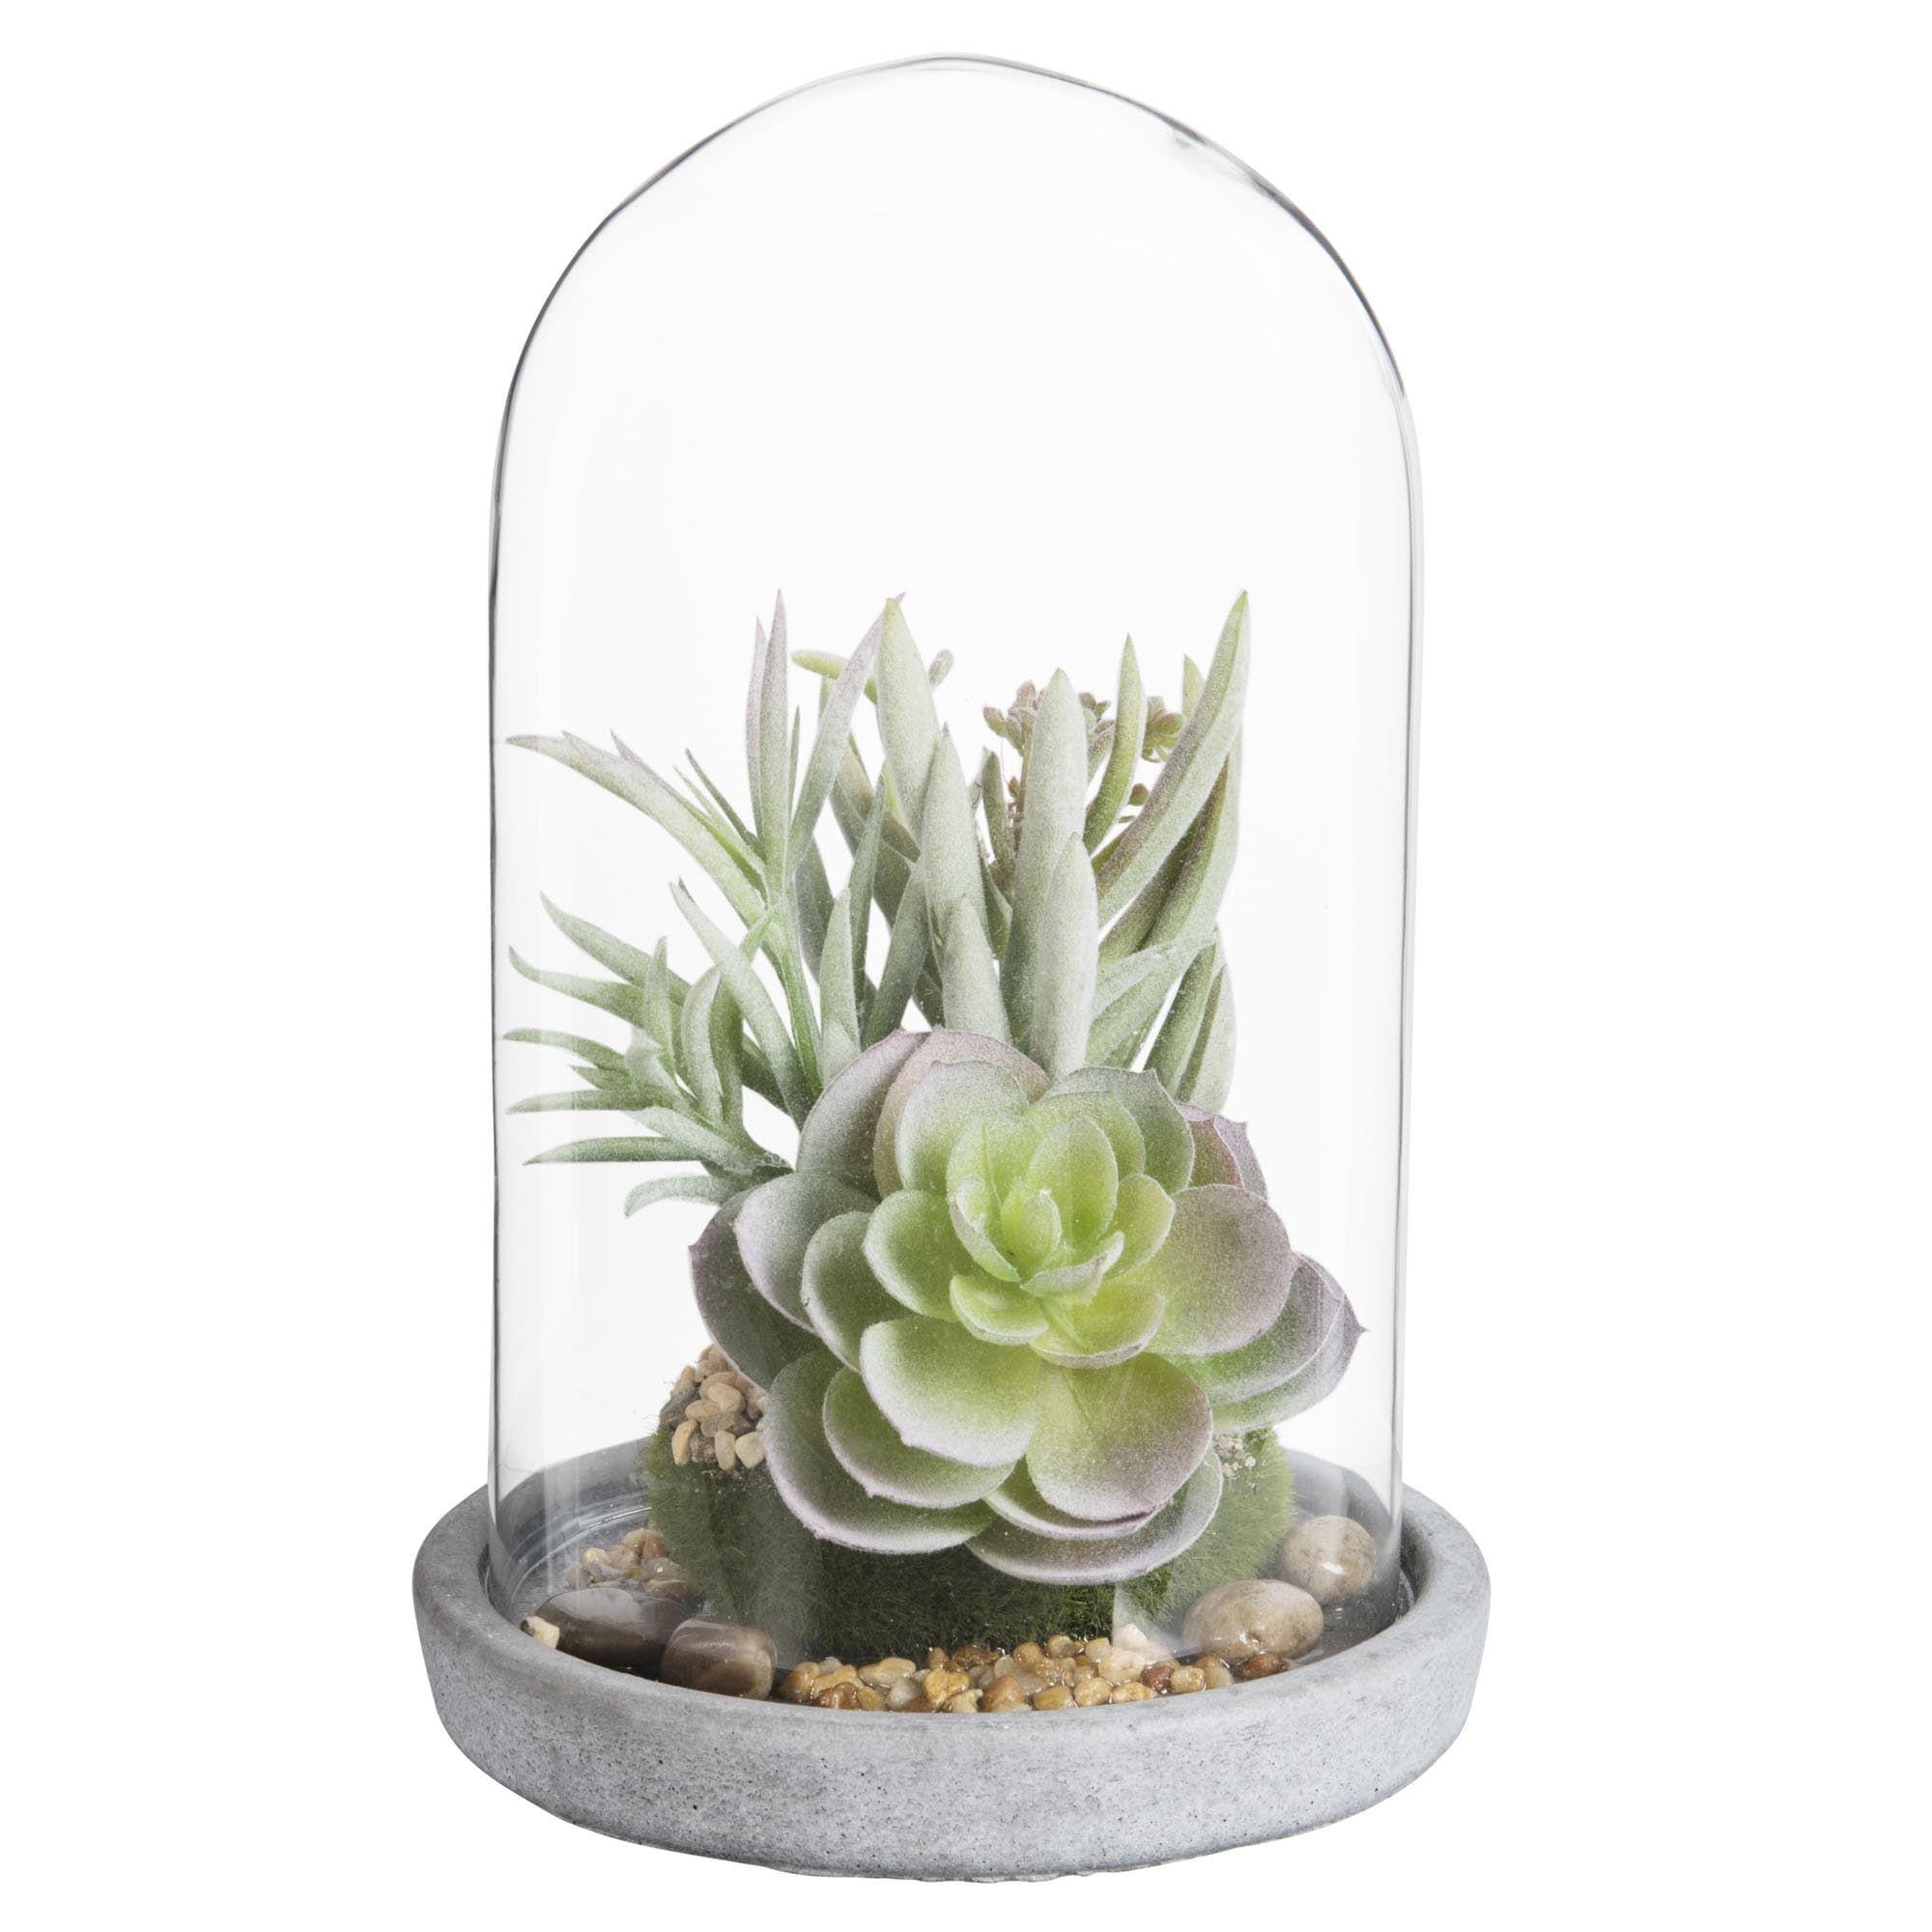 plantes grasses artificielles sous cloche en verre. Black Bedroom Furniture Sets. Home Design Ideas